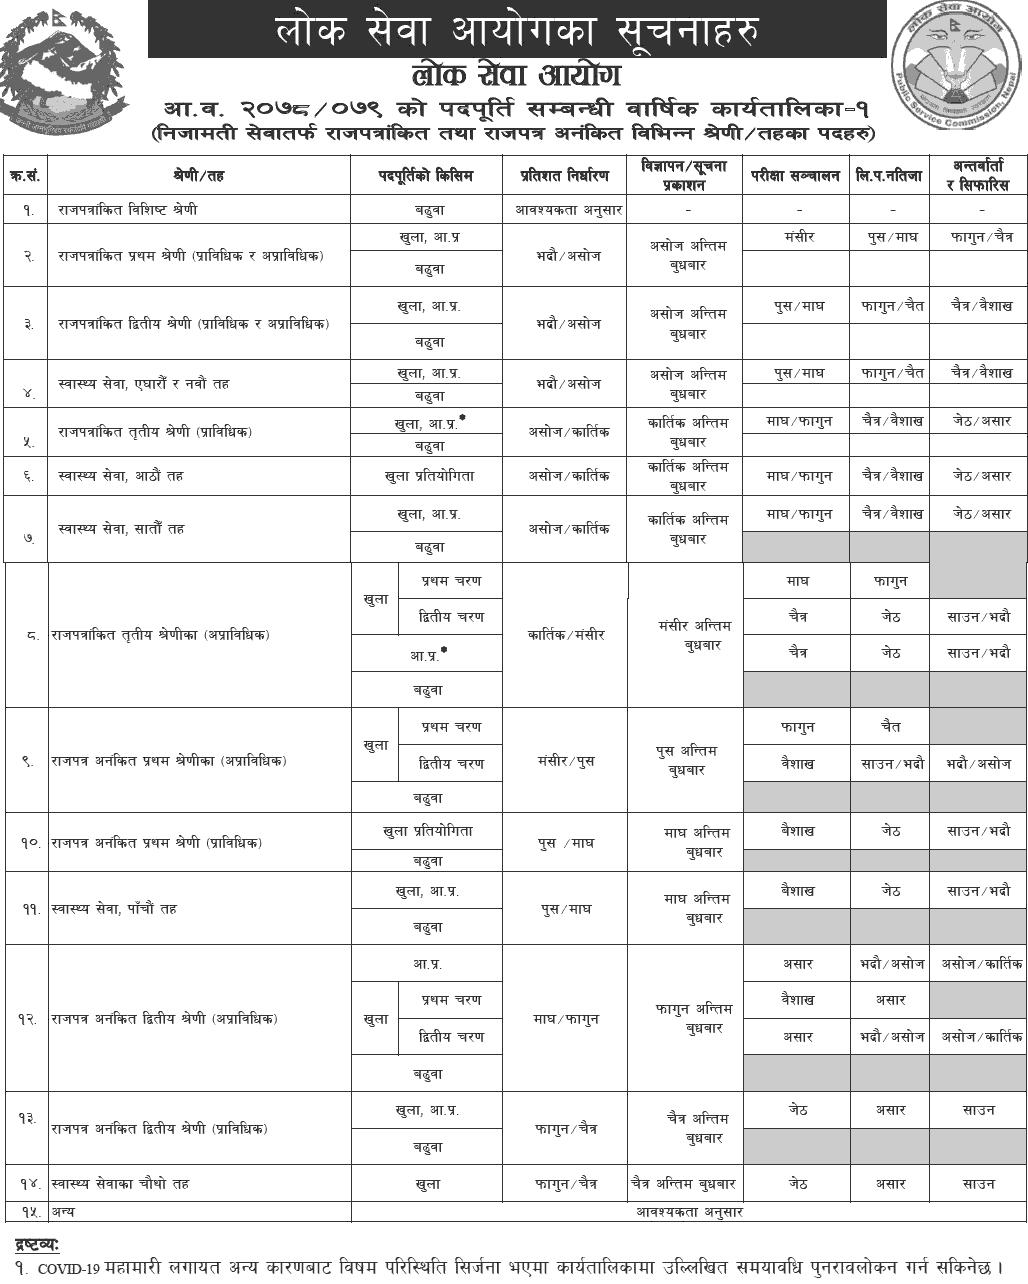 Lok Sewa Aayog Vacancy Yearly Calendar 2078-2079